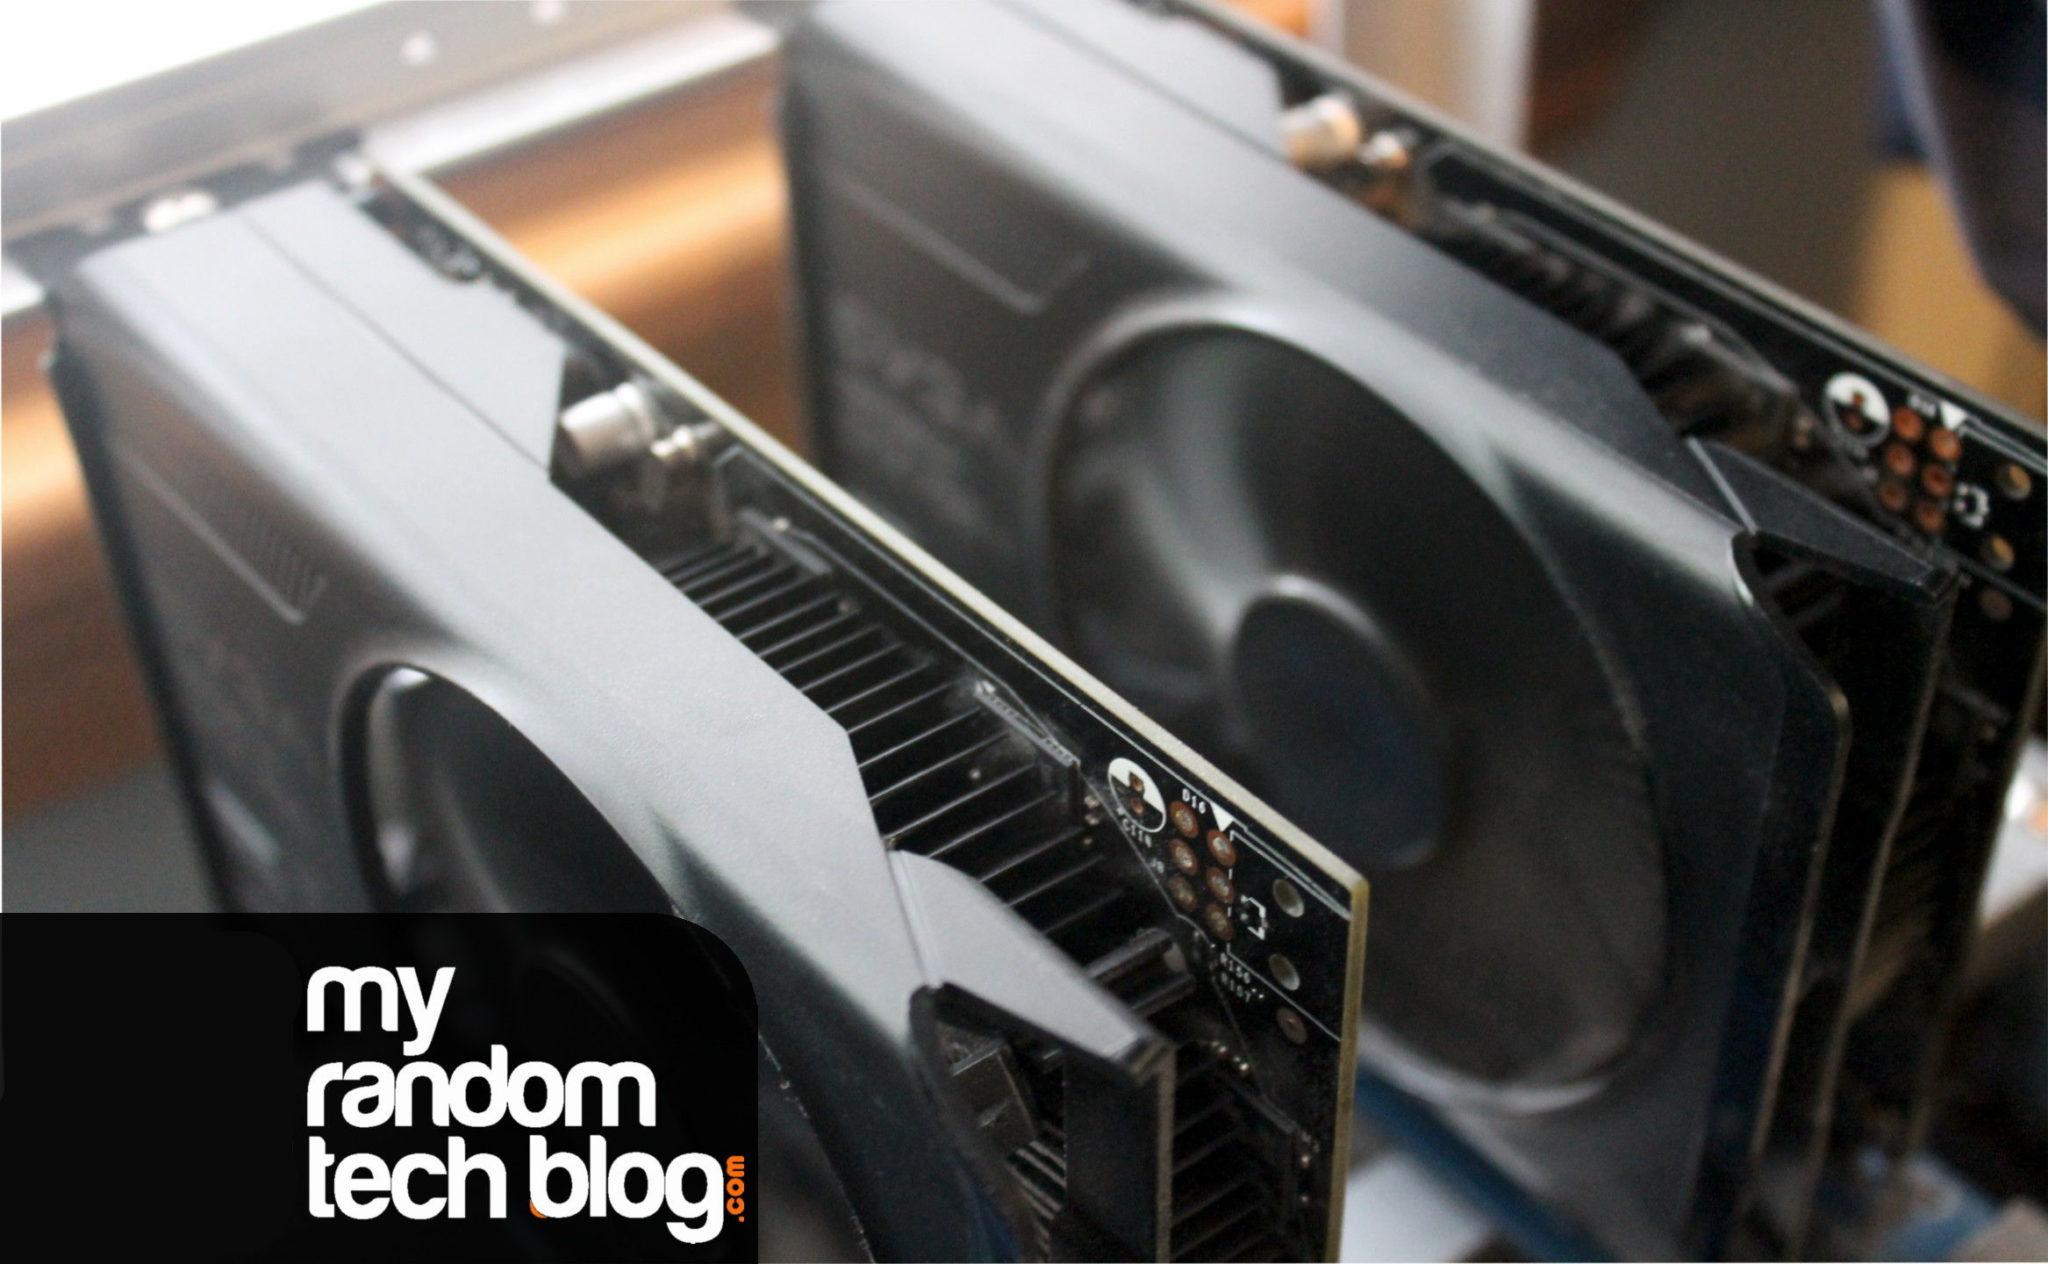 Mining x16r (Ravencoin) with a Nvidia GTX 750ti